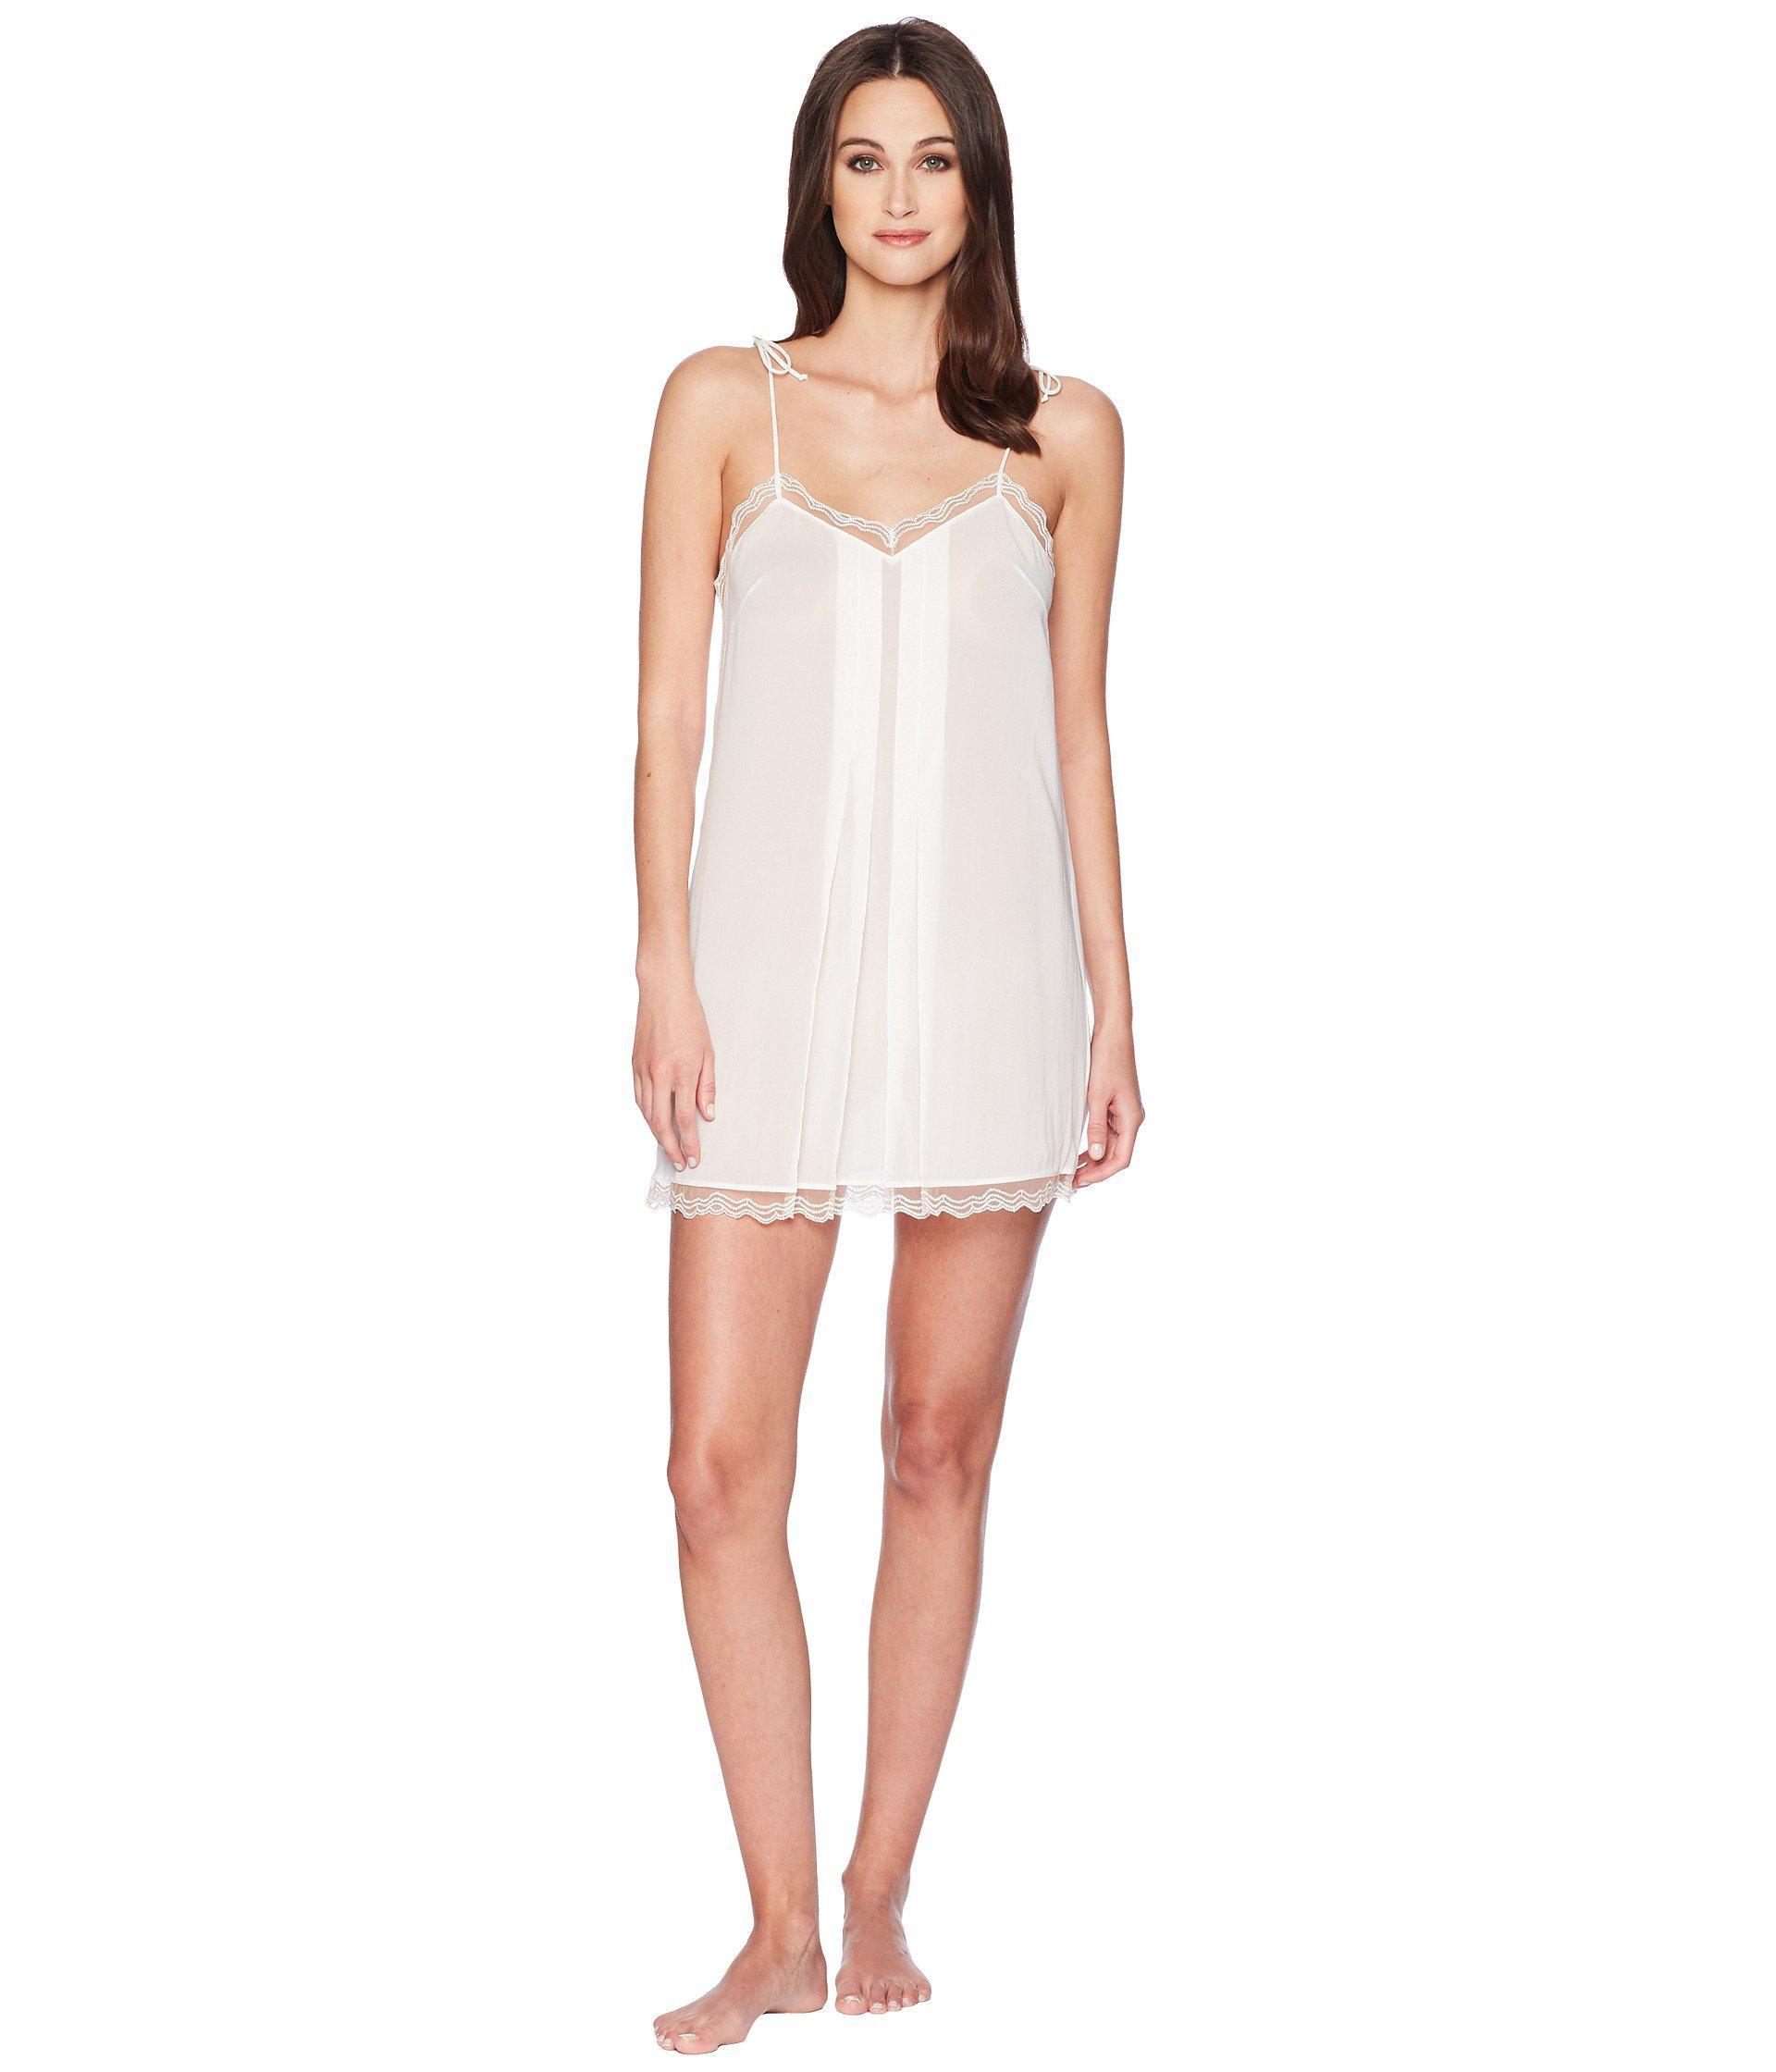 Lyst - La Perla Marble Mood Chemise (black skin) Women s Pajama in White 2879e36cb